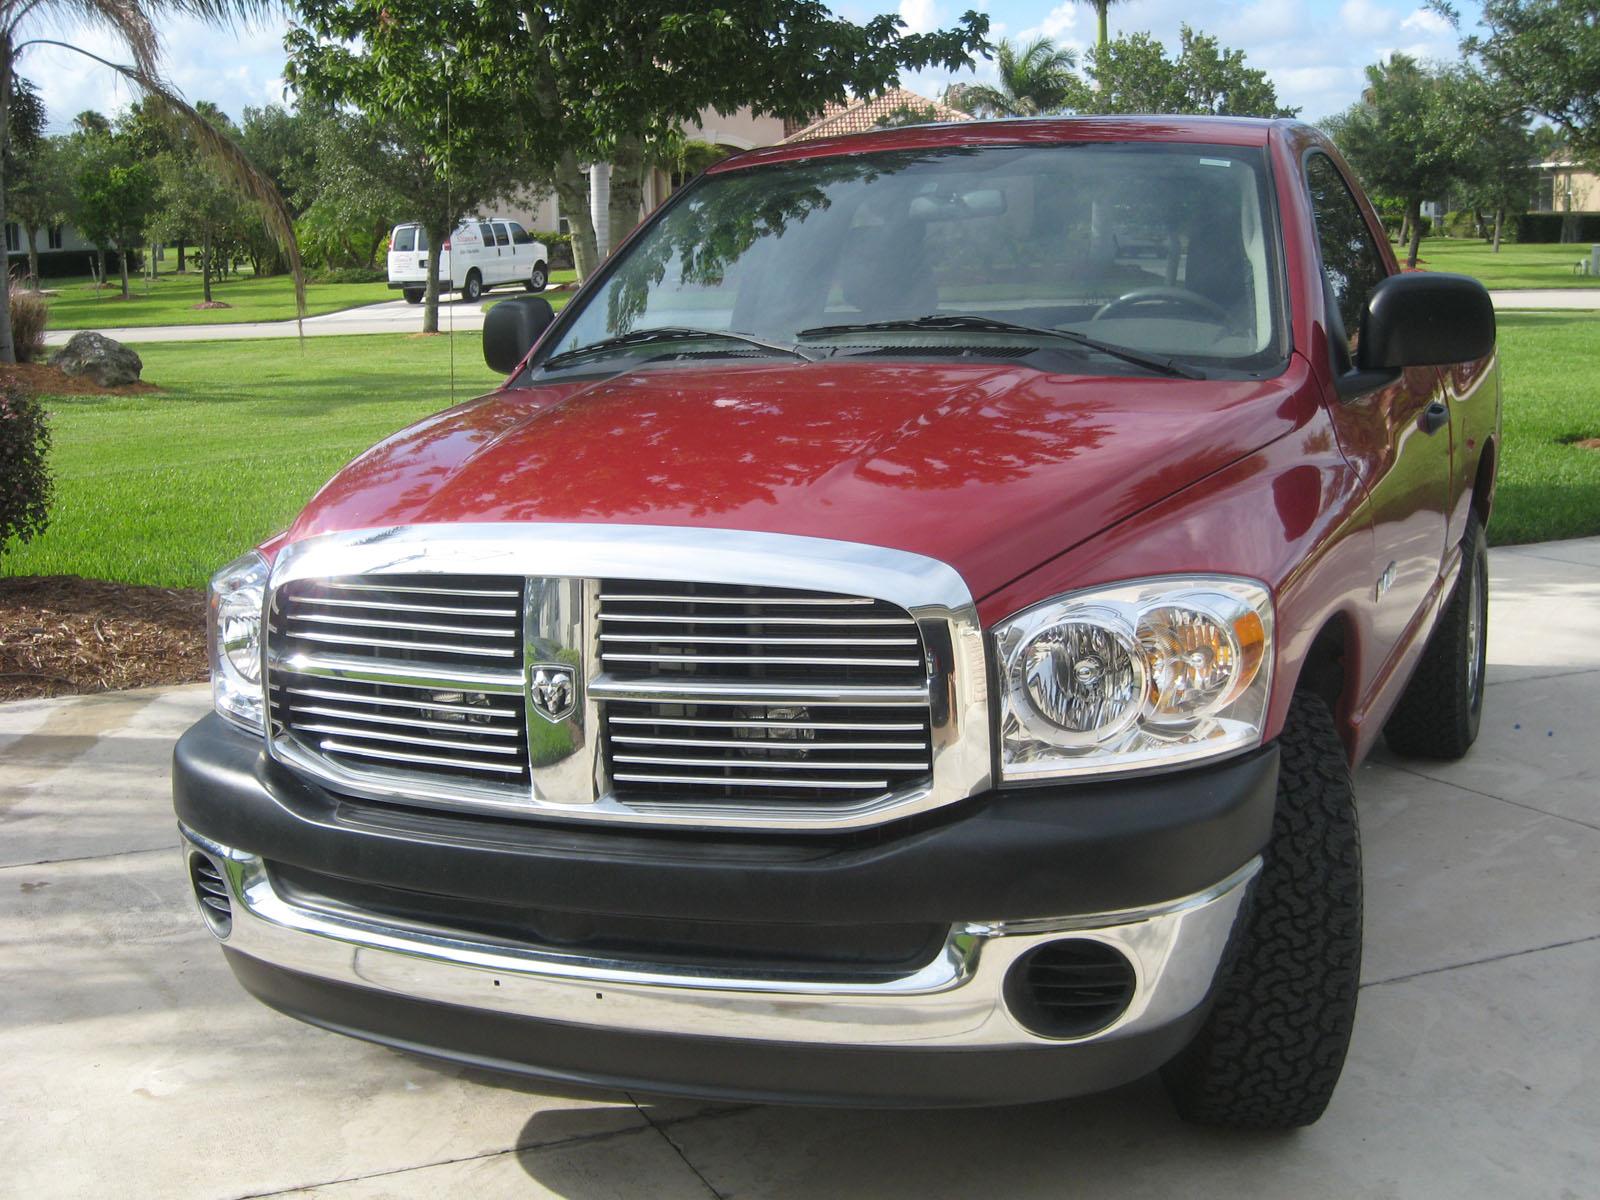 2008 Dodge Ram 1500 For Sale Sarasota Florida